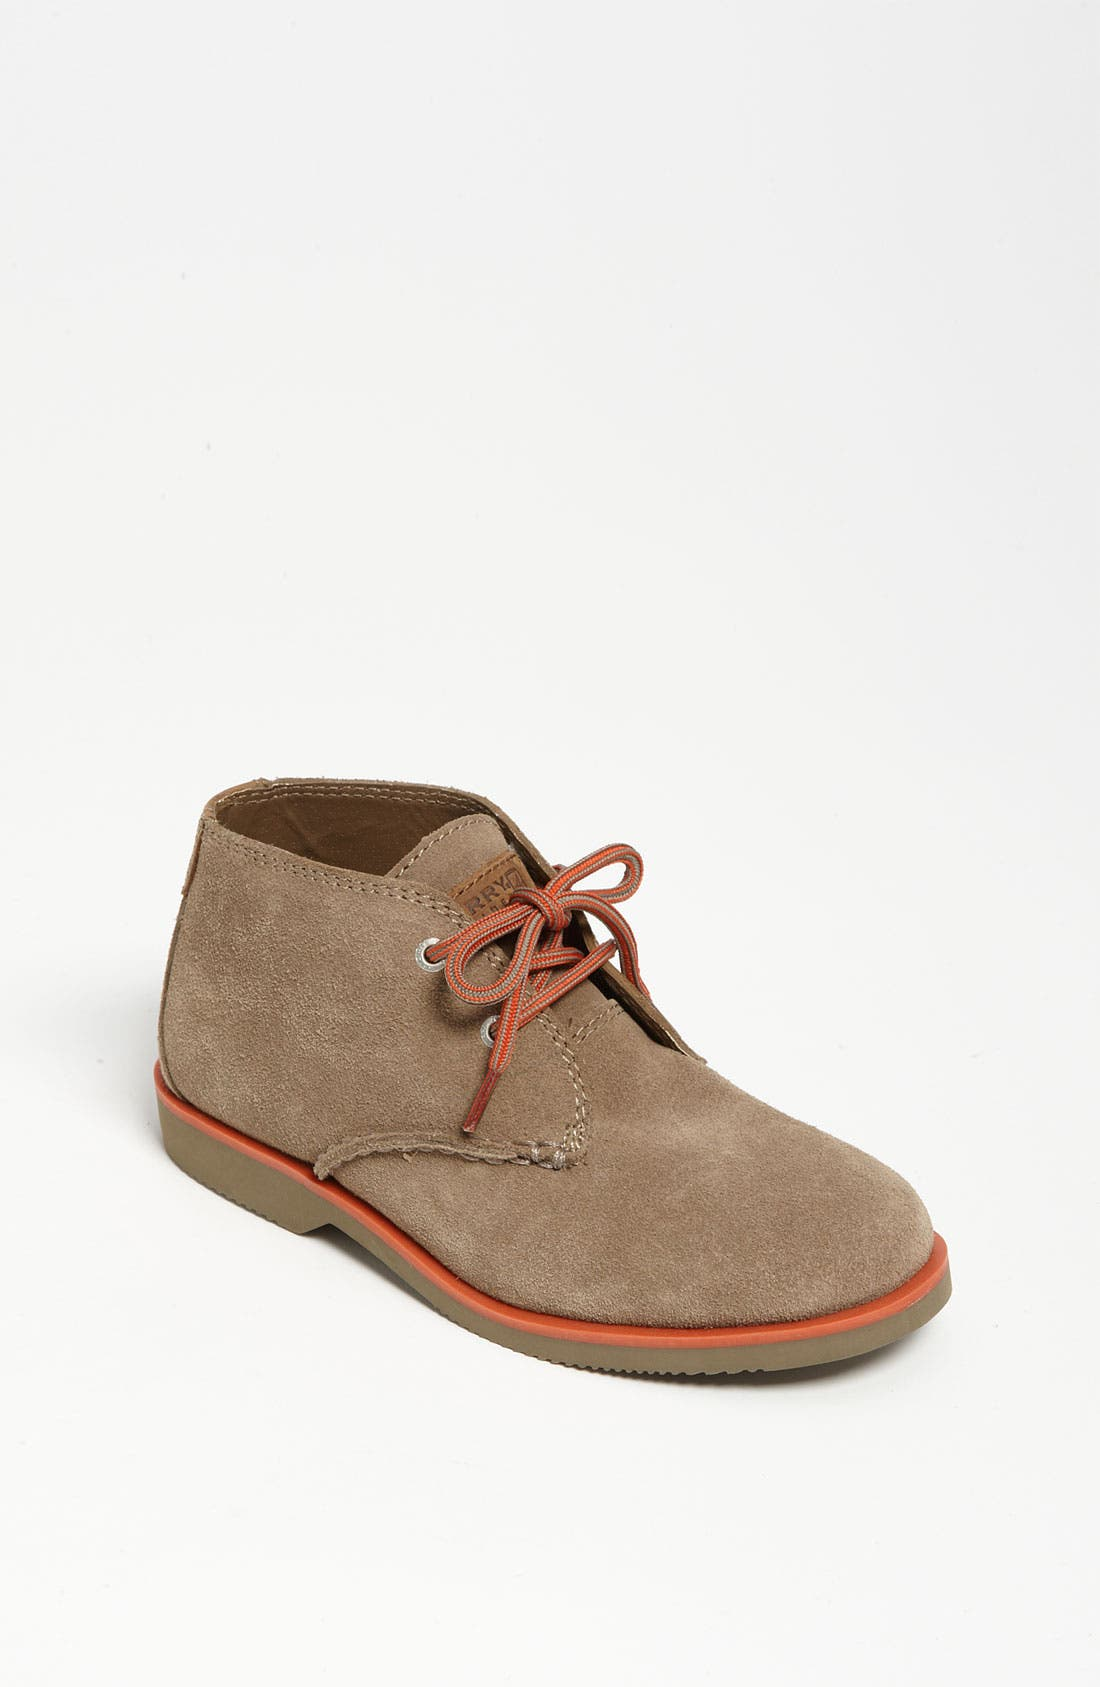 Main Image - Sperry Top-Sider® 'Gunnel' Boot (Little Kid & Big Kid)